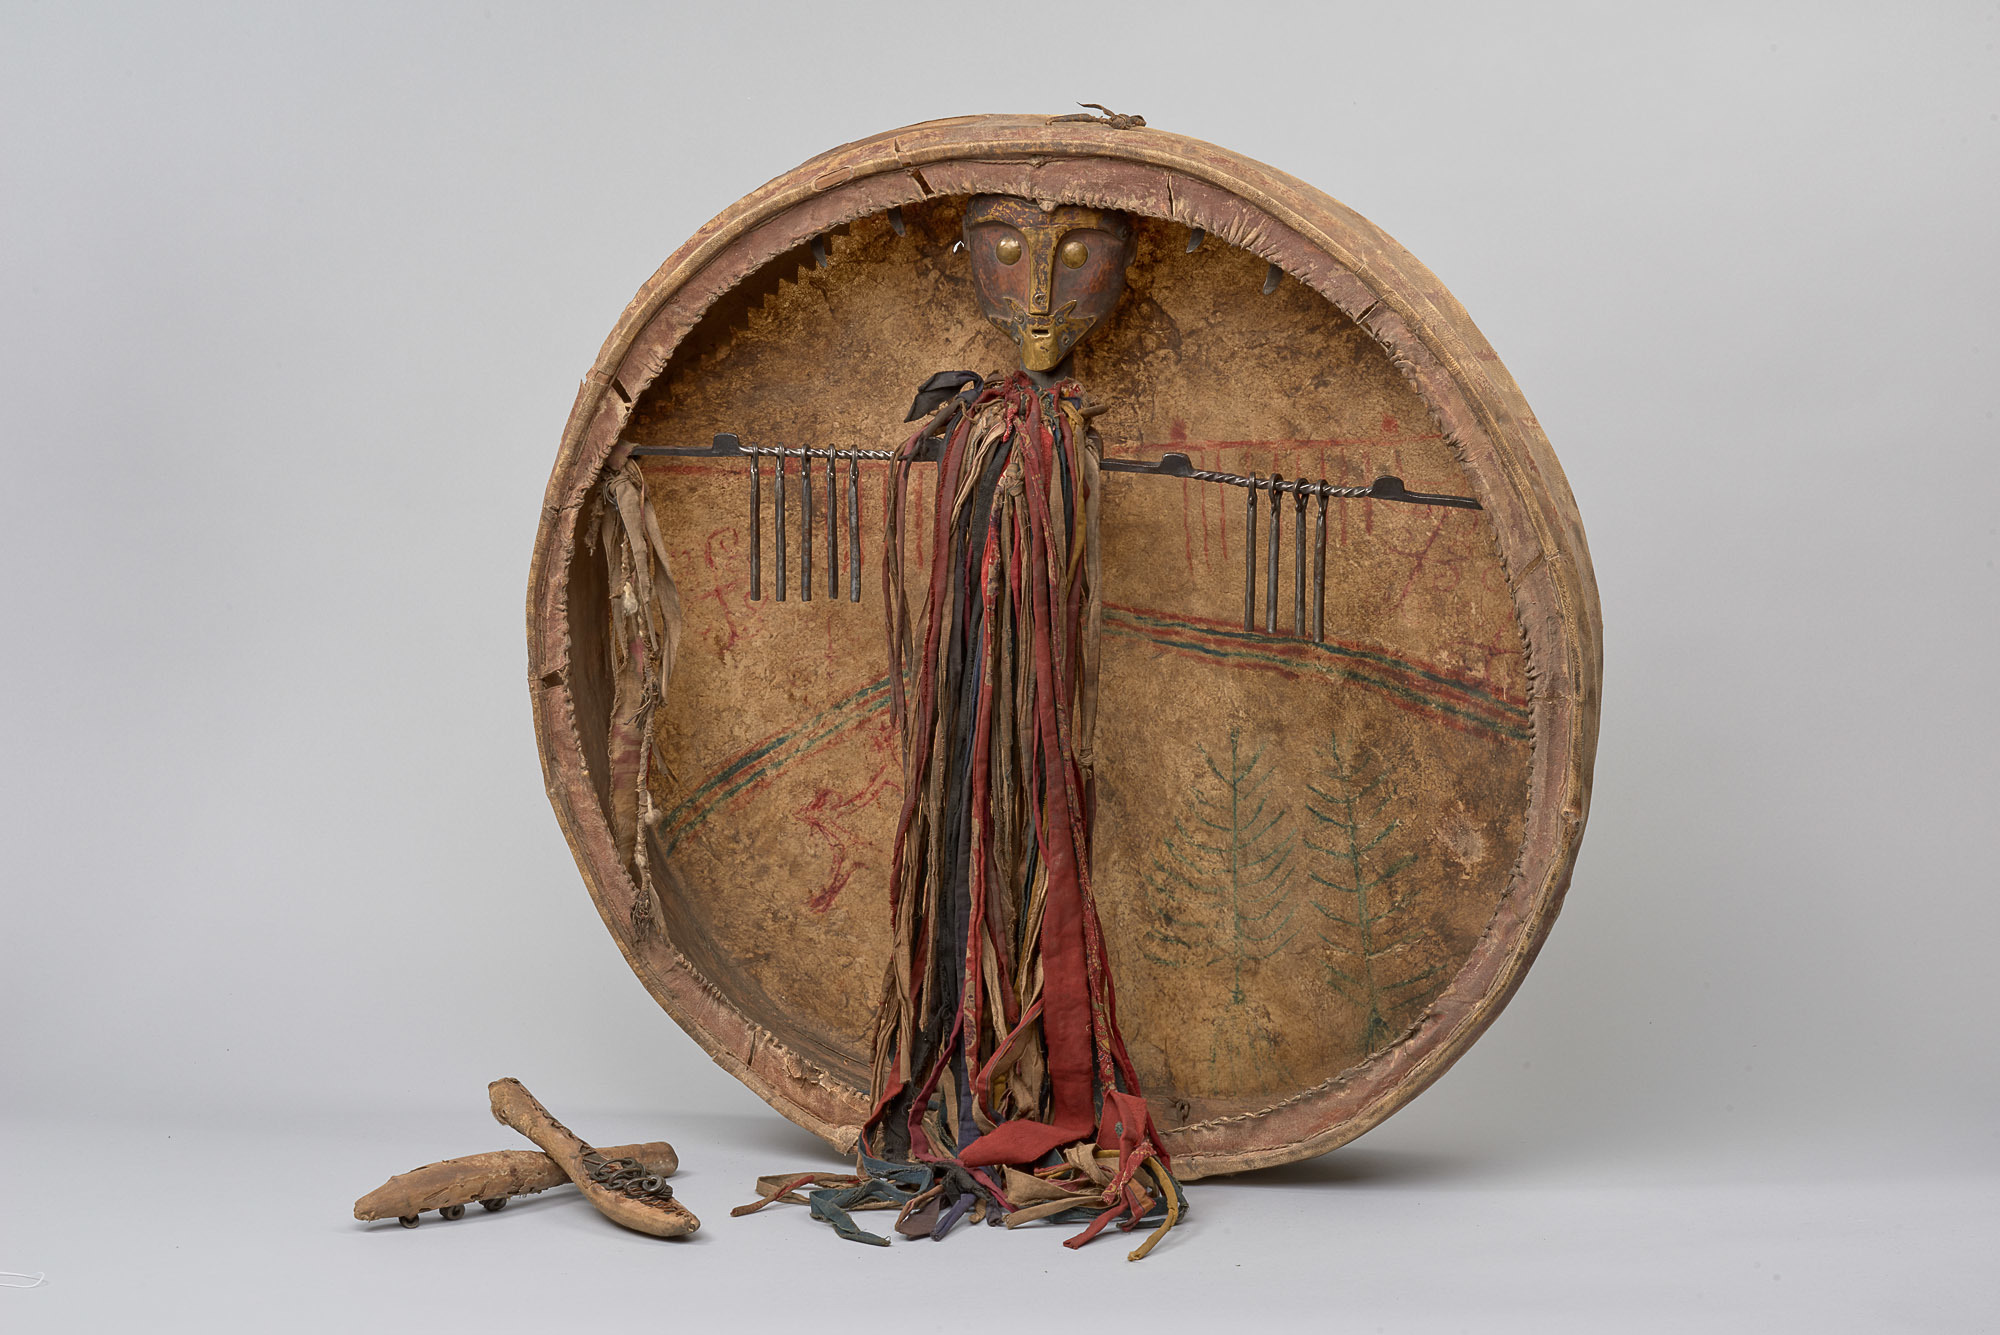 Siberian Shaman's Drum | Before 1931 © KHM-Museumsverband